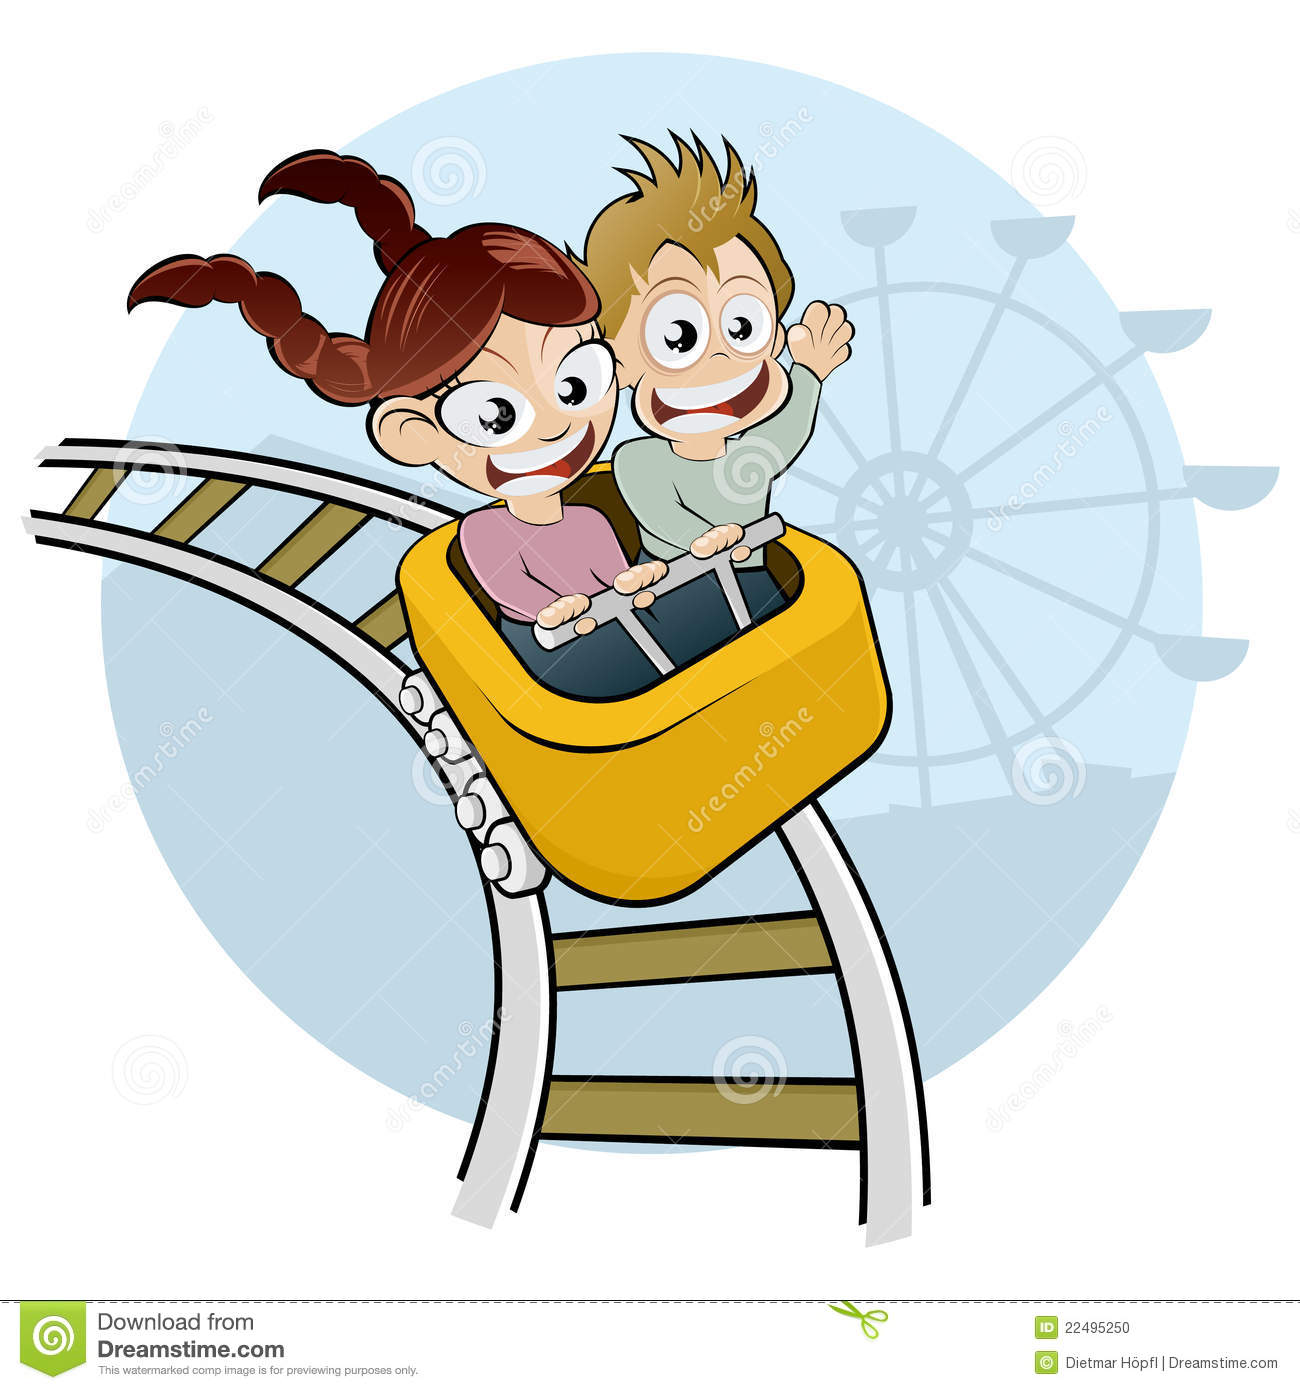 Cartoon Roller Coaster Clipart - Clipart Suggest